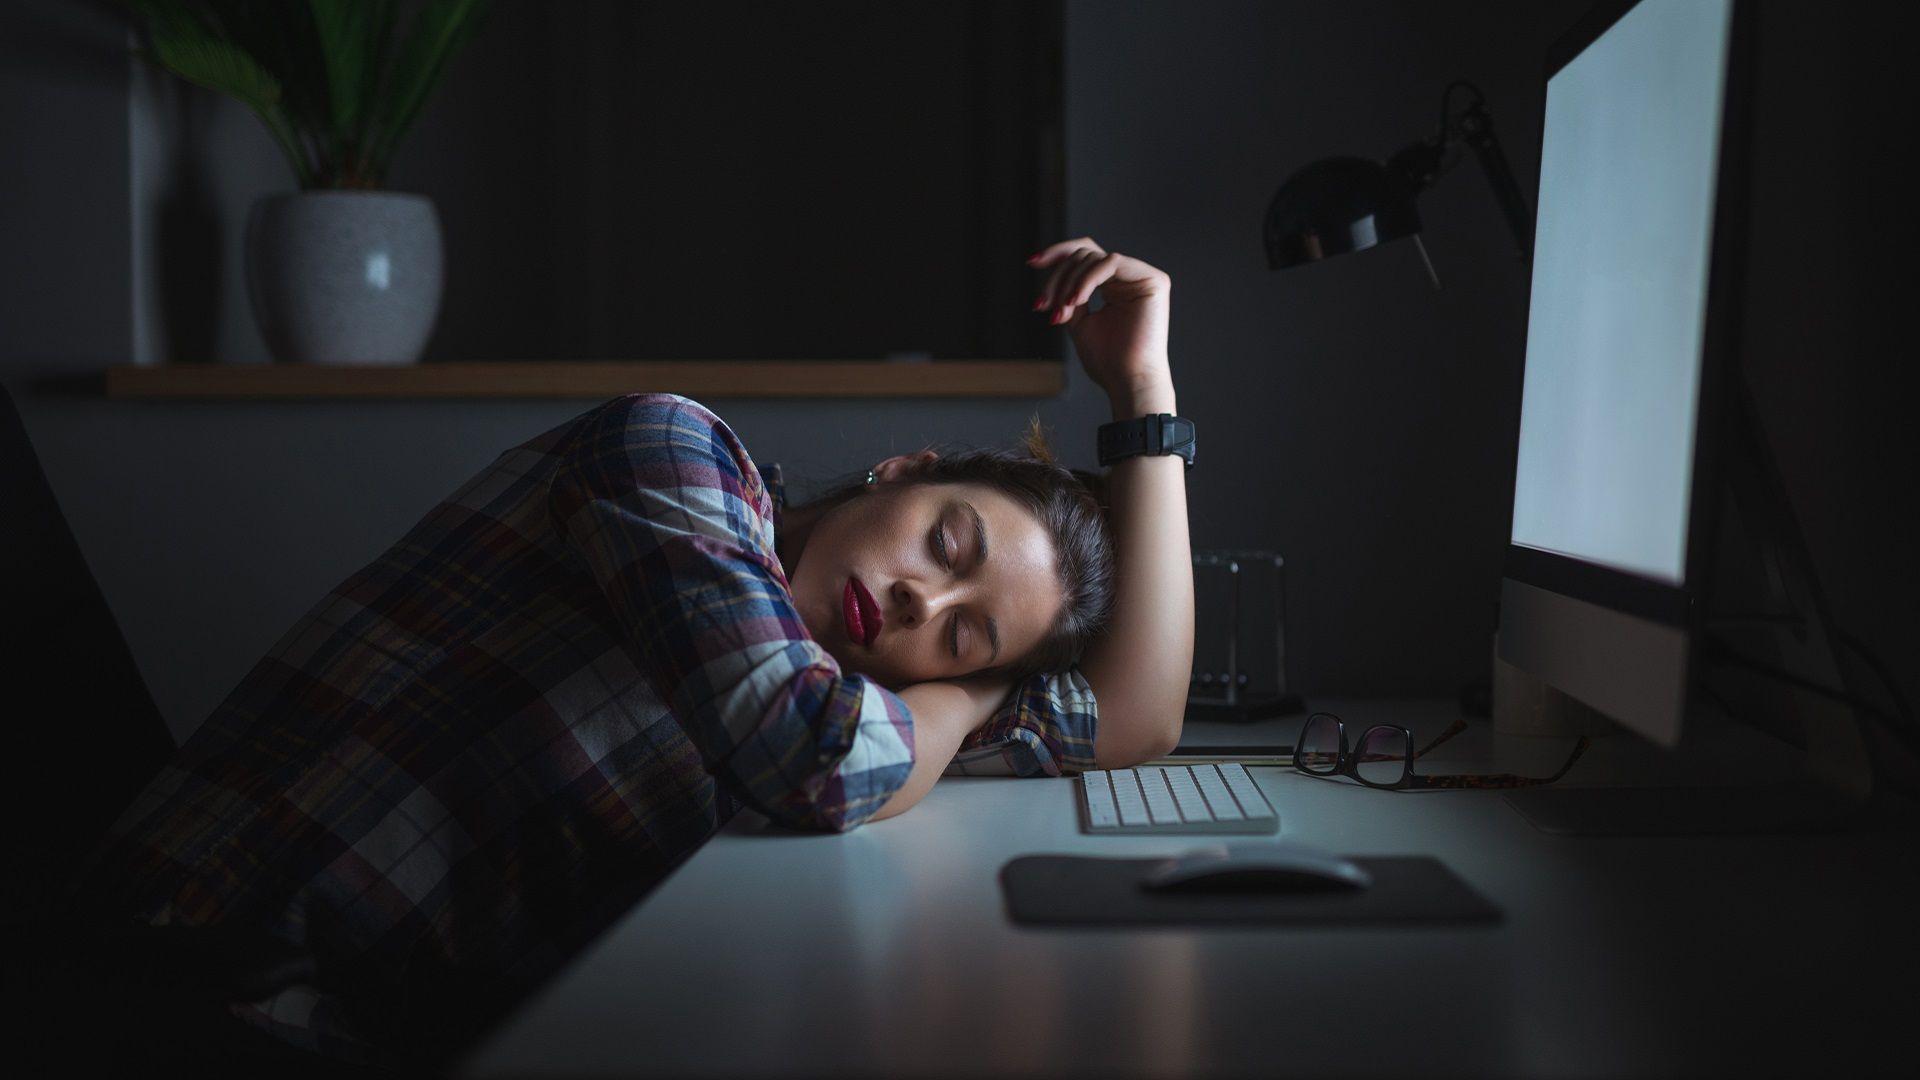 3 uur slaap met dutjes voldoende